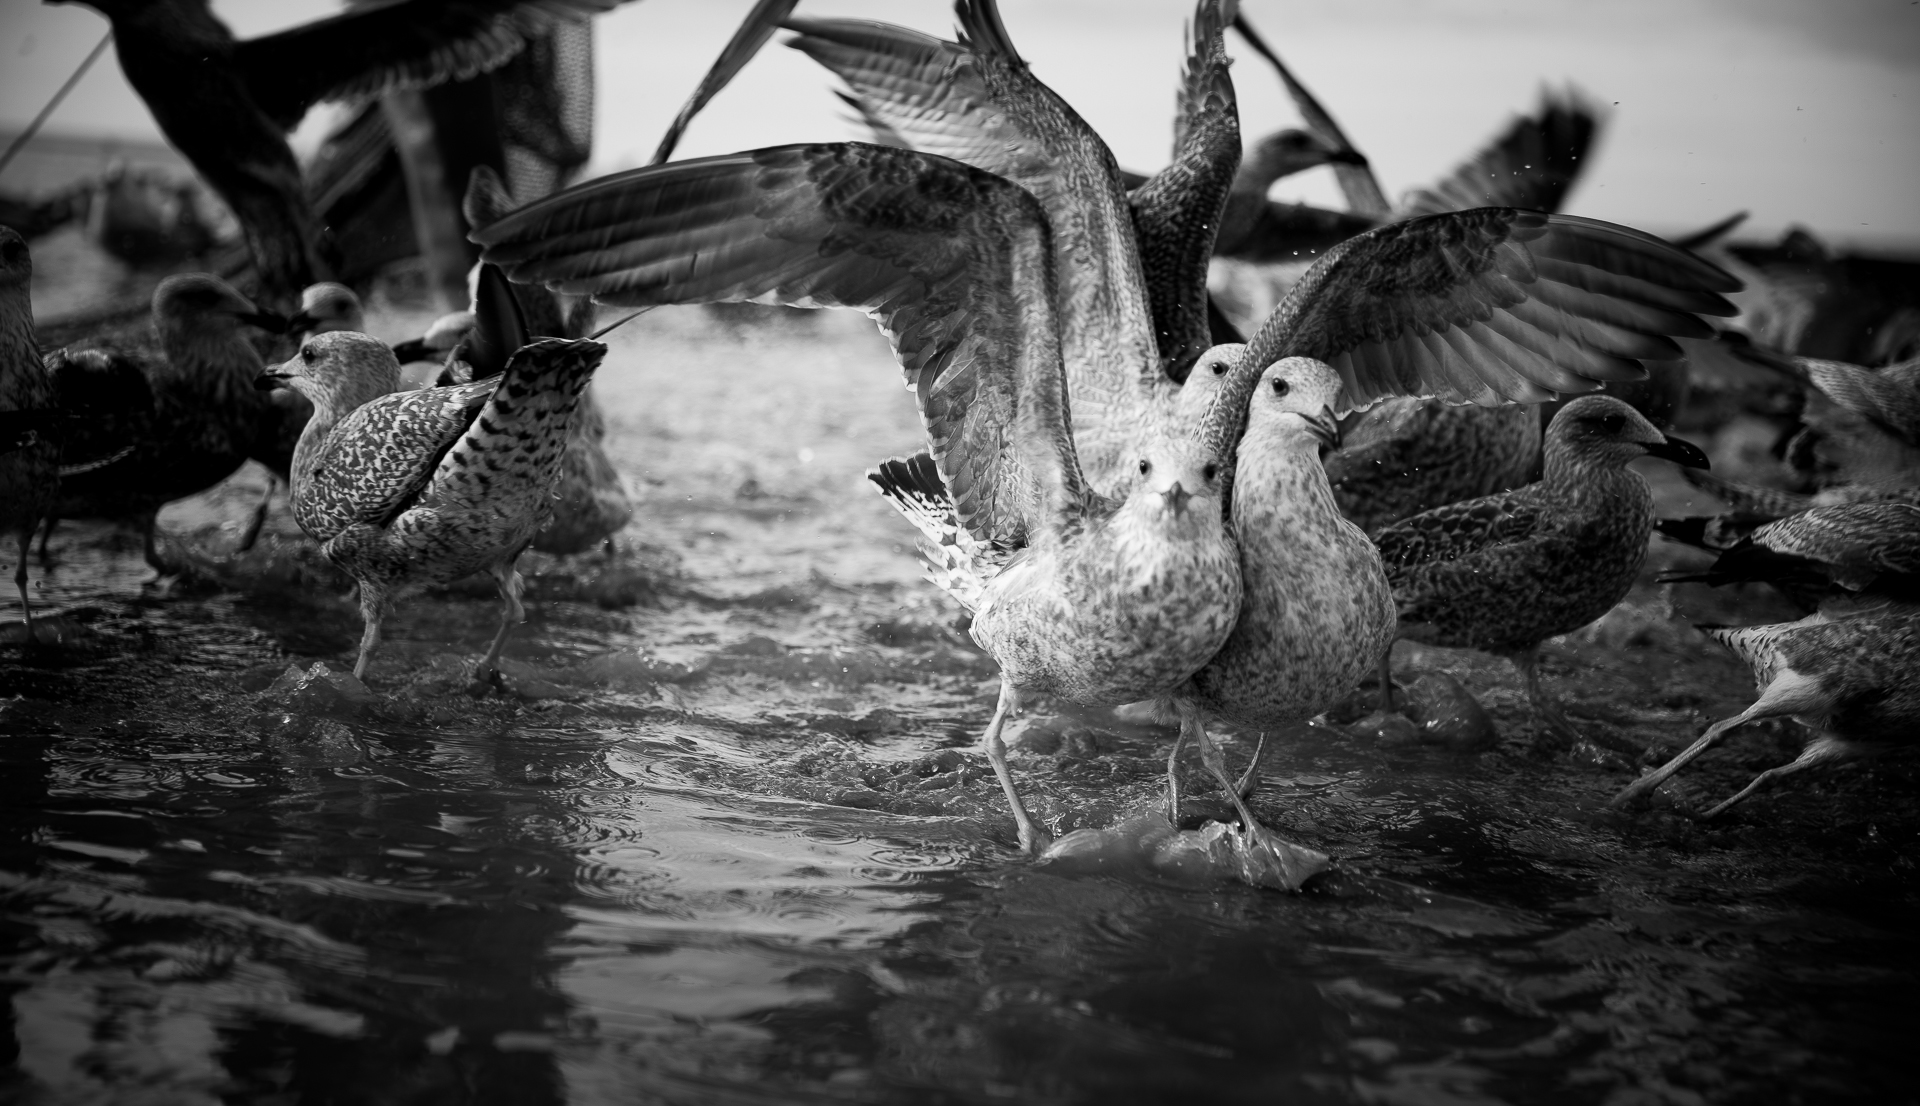 Seagulls enjoying the result of fish